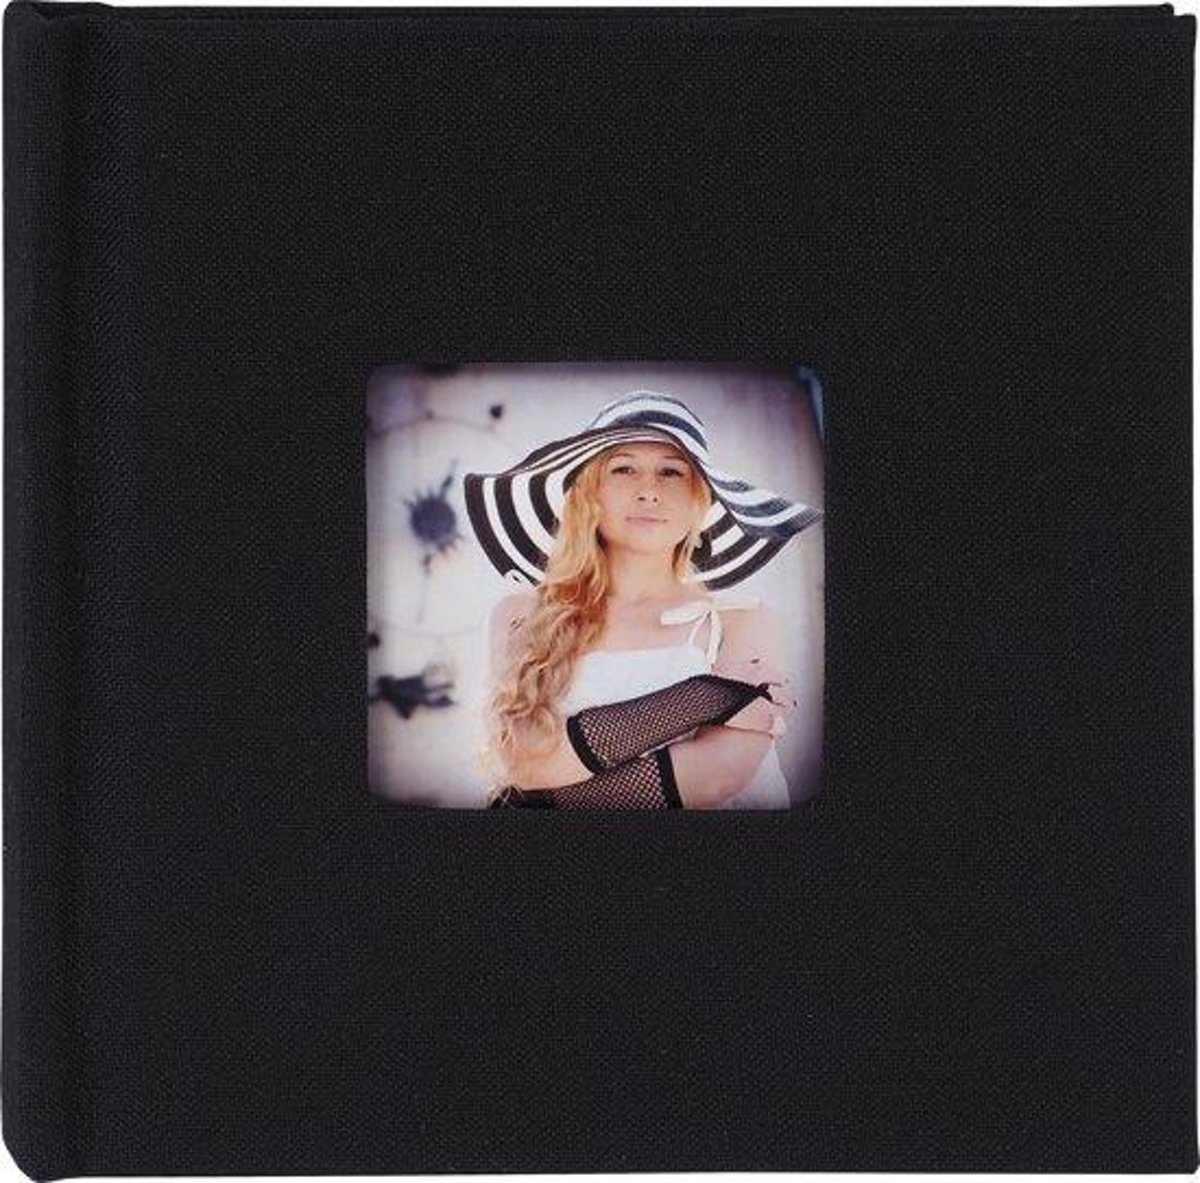 FotoHolland -Mini Fotoalbum 10x10 cm - 12 pagina's zwart Brillianta zwart, met venster - MBB101012BL